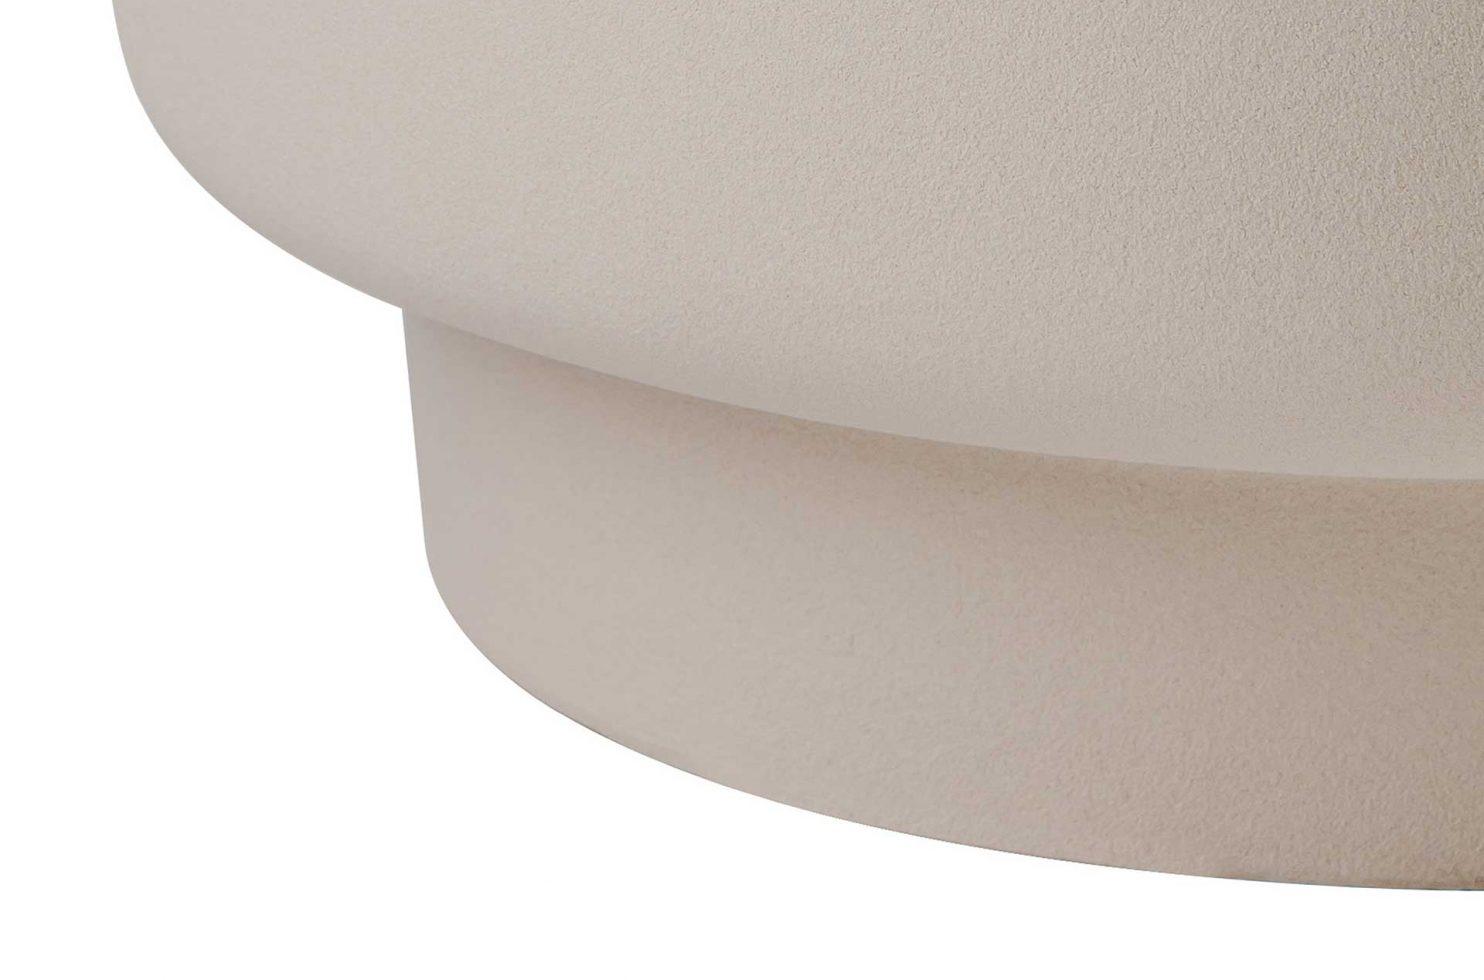 prov cer balance stool 16in C3080403435 linen sand dtl2 web